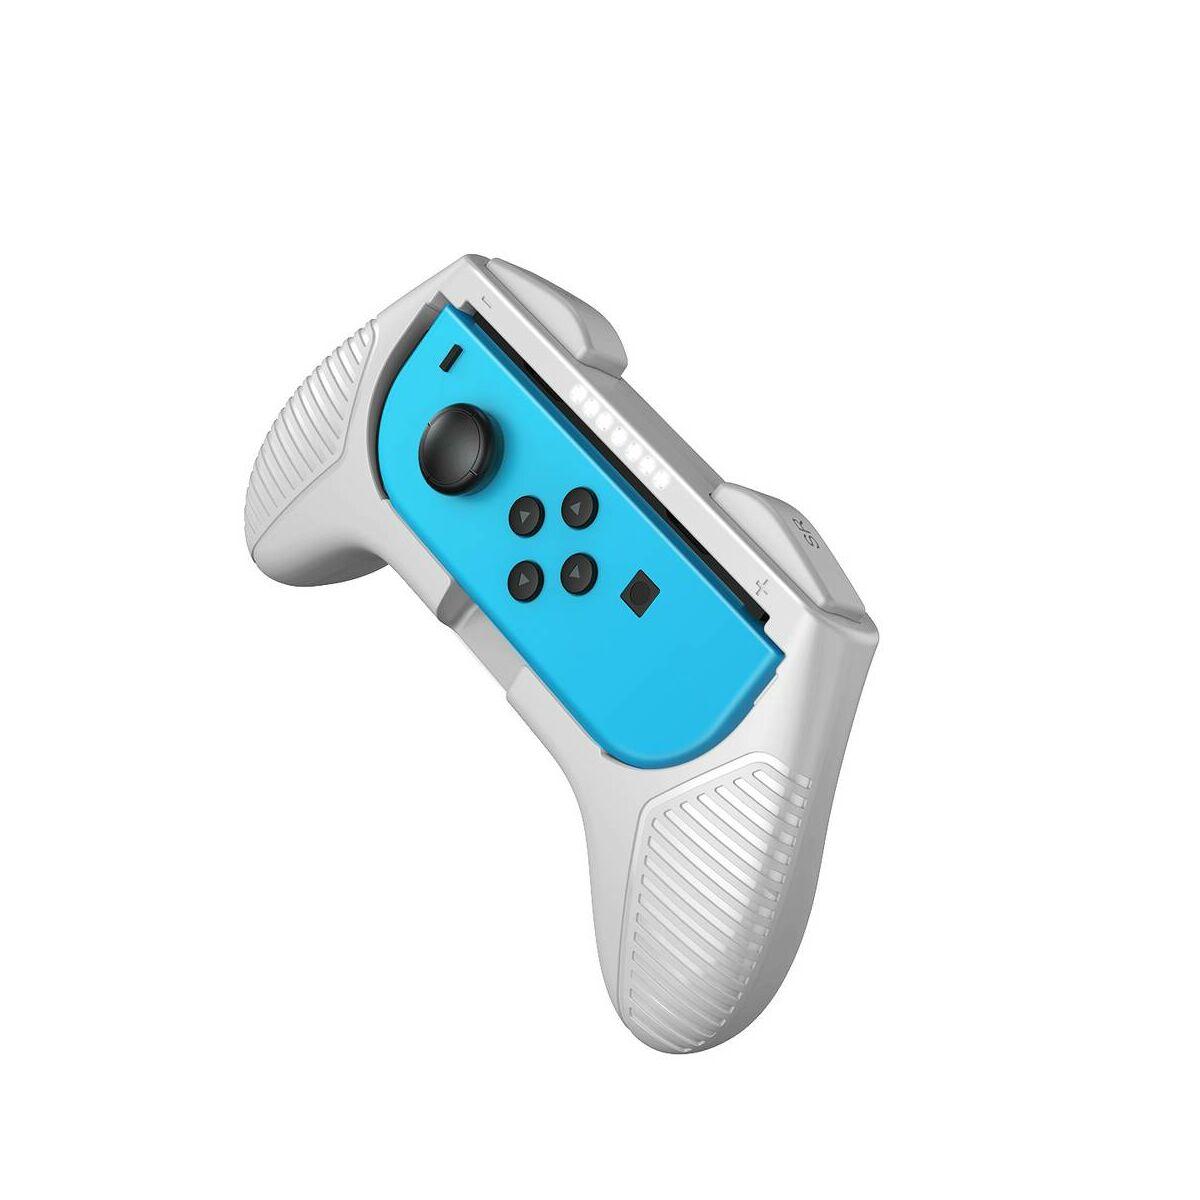 Baseus játék eszköz, Nintendo Switch SW kis fogantyú Joystick pad (2db), szürke (GMSWC-0G)